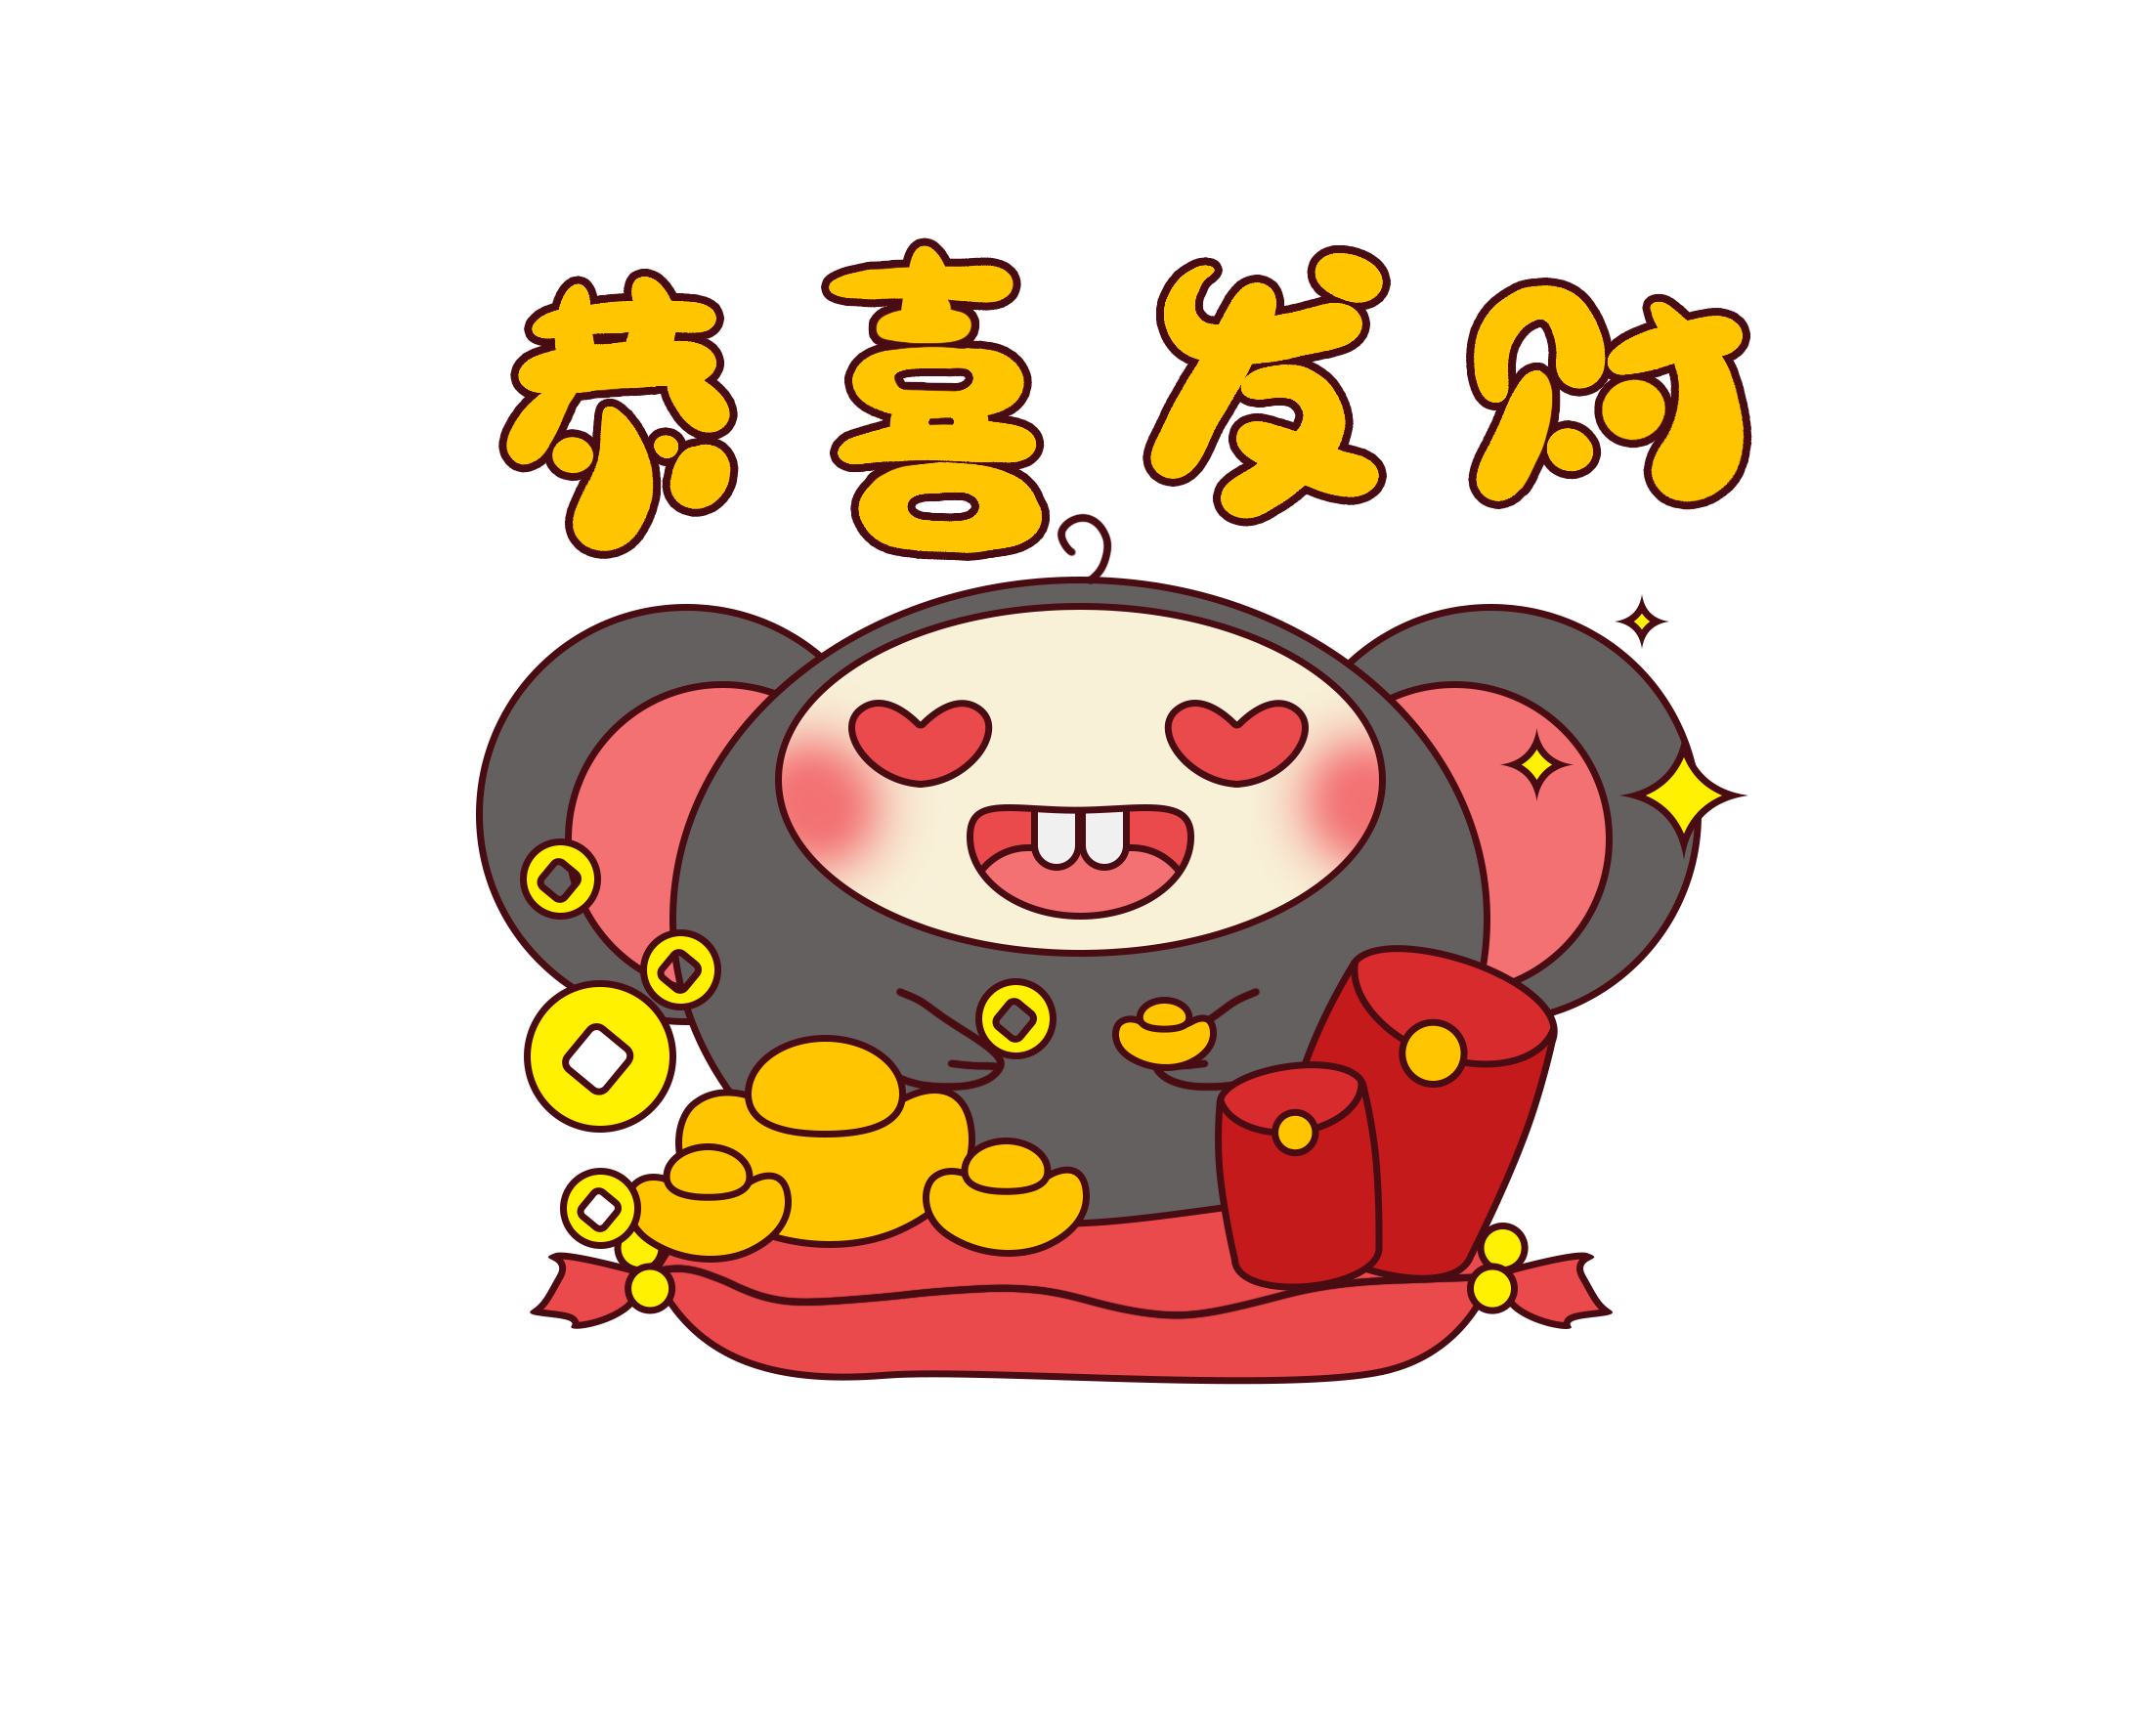 小福鼠好运连年 messages sticker-5